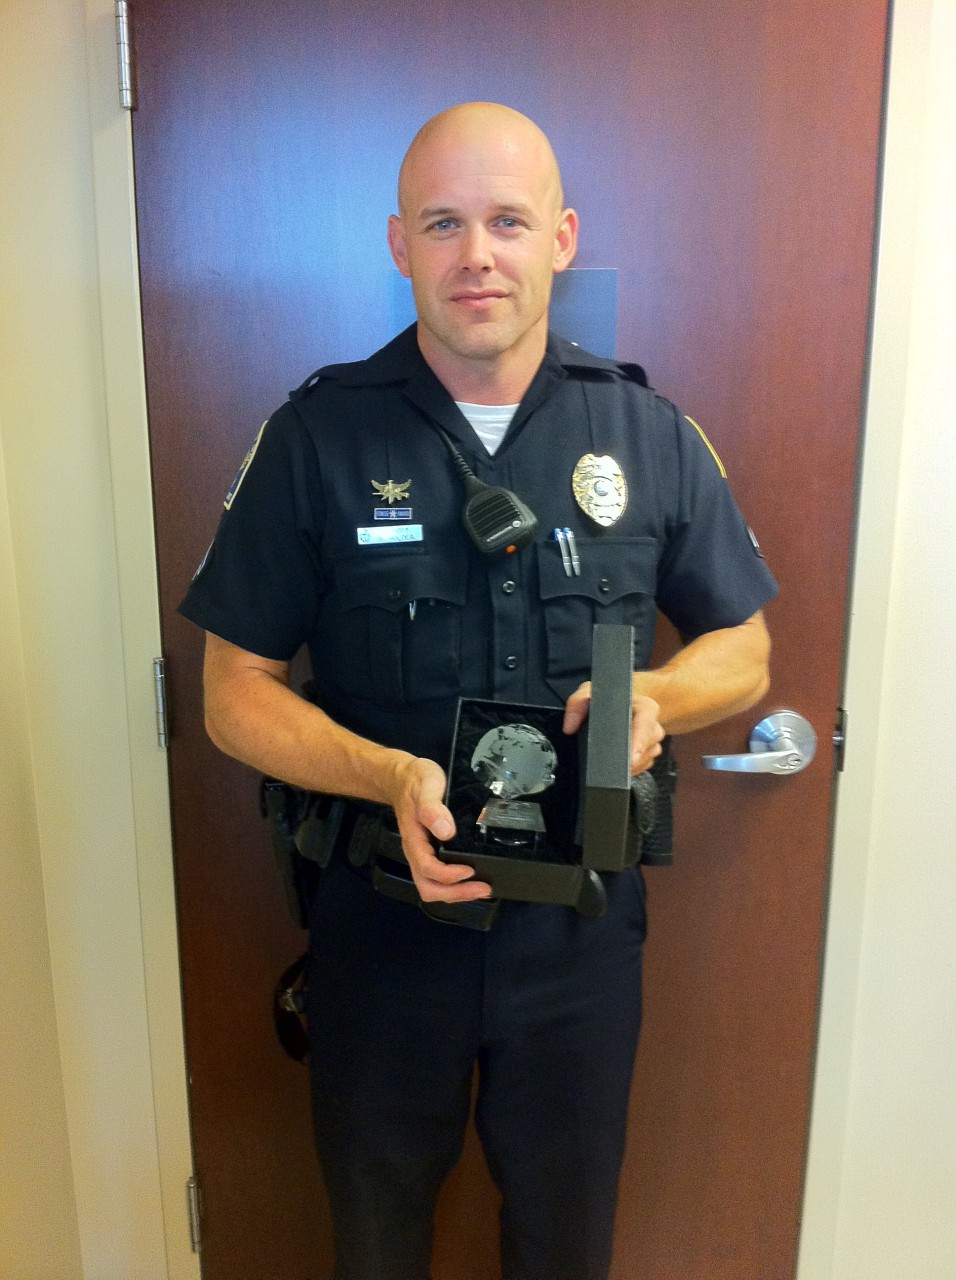 Field Training Officer Bradley Holder - Clarksville, TN Online